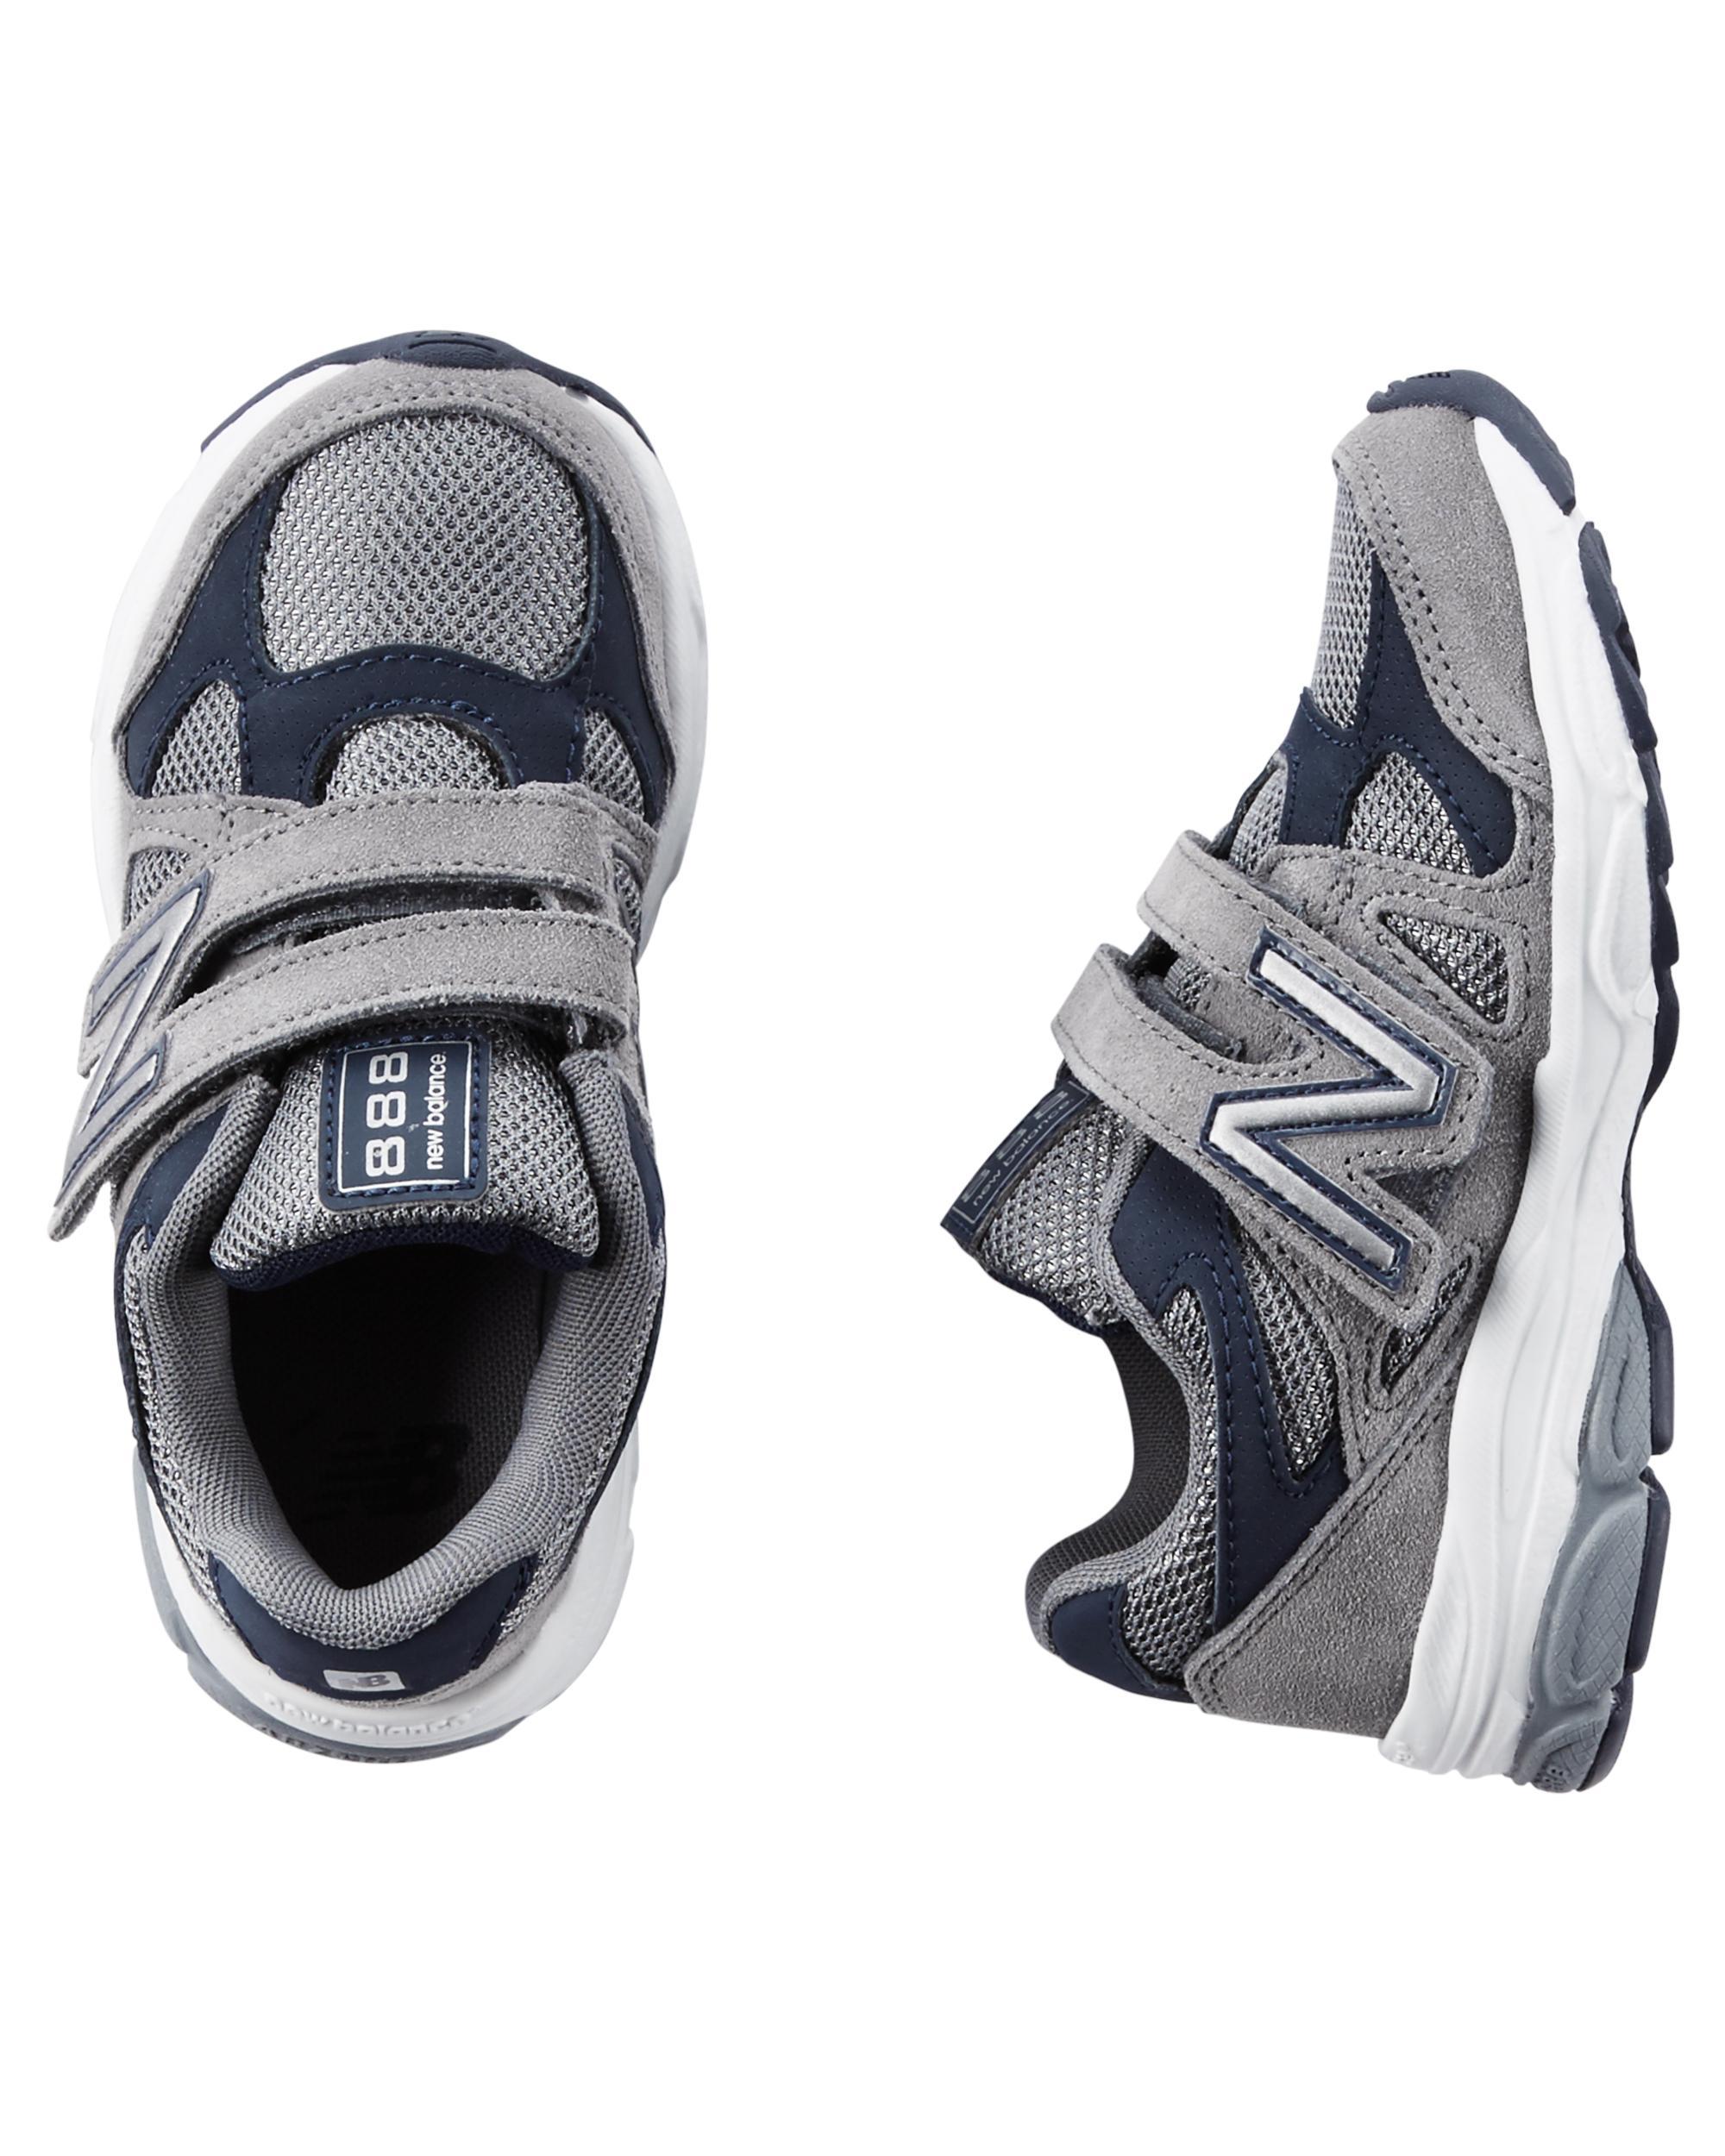 df2c3ca0 New Balance Hook & Loop 888 Sneakers | carters.com